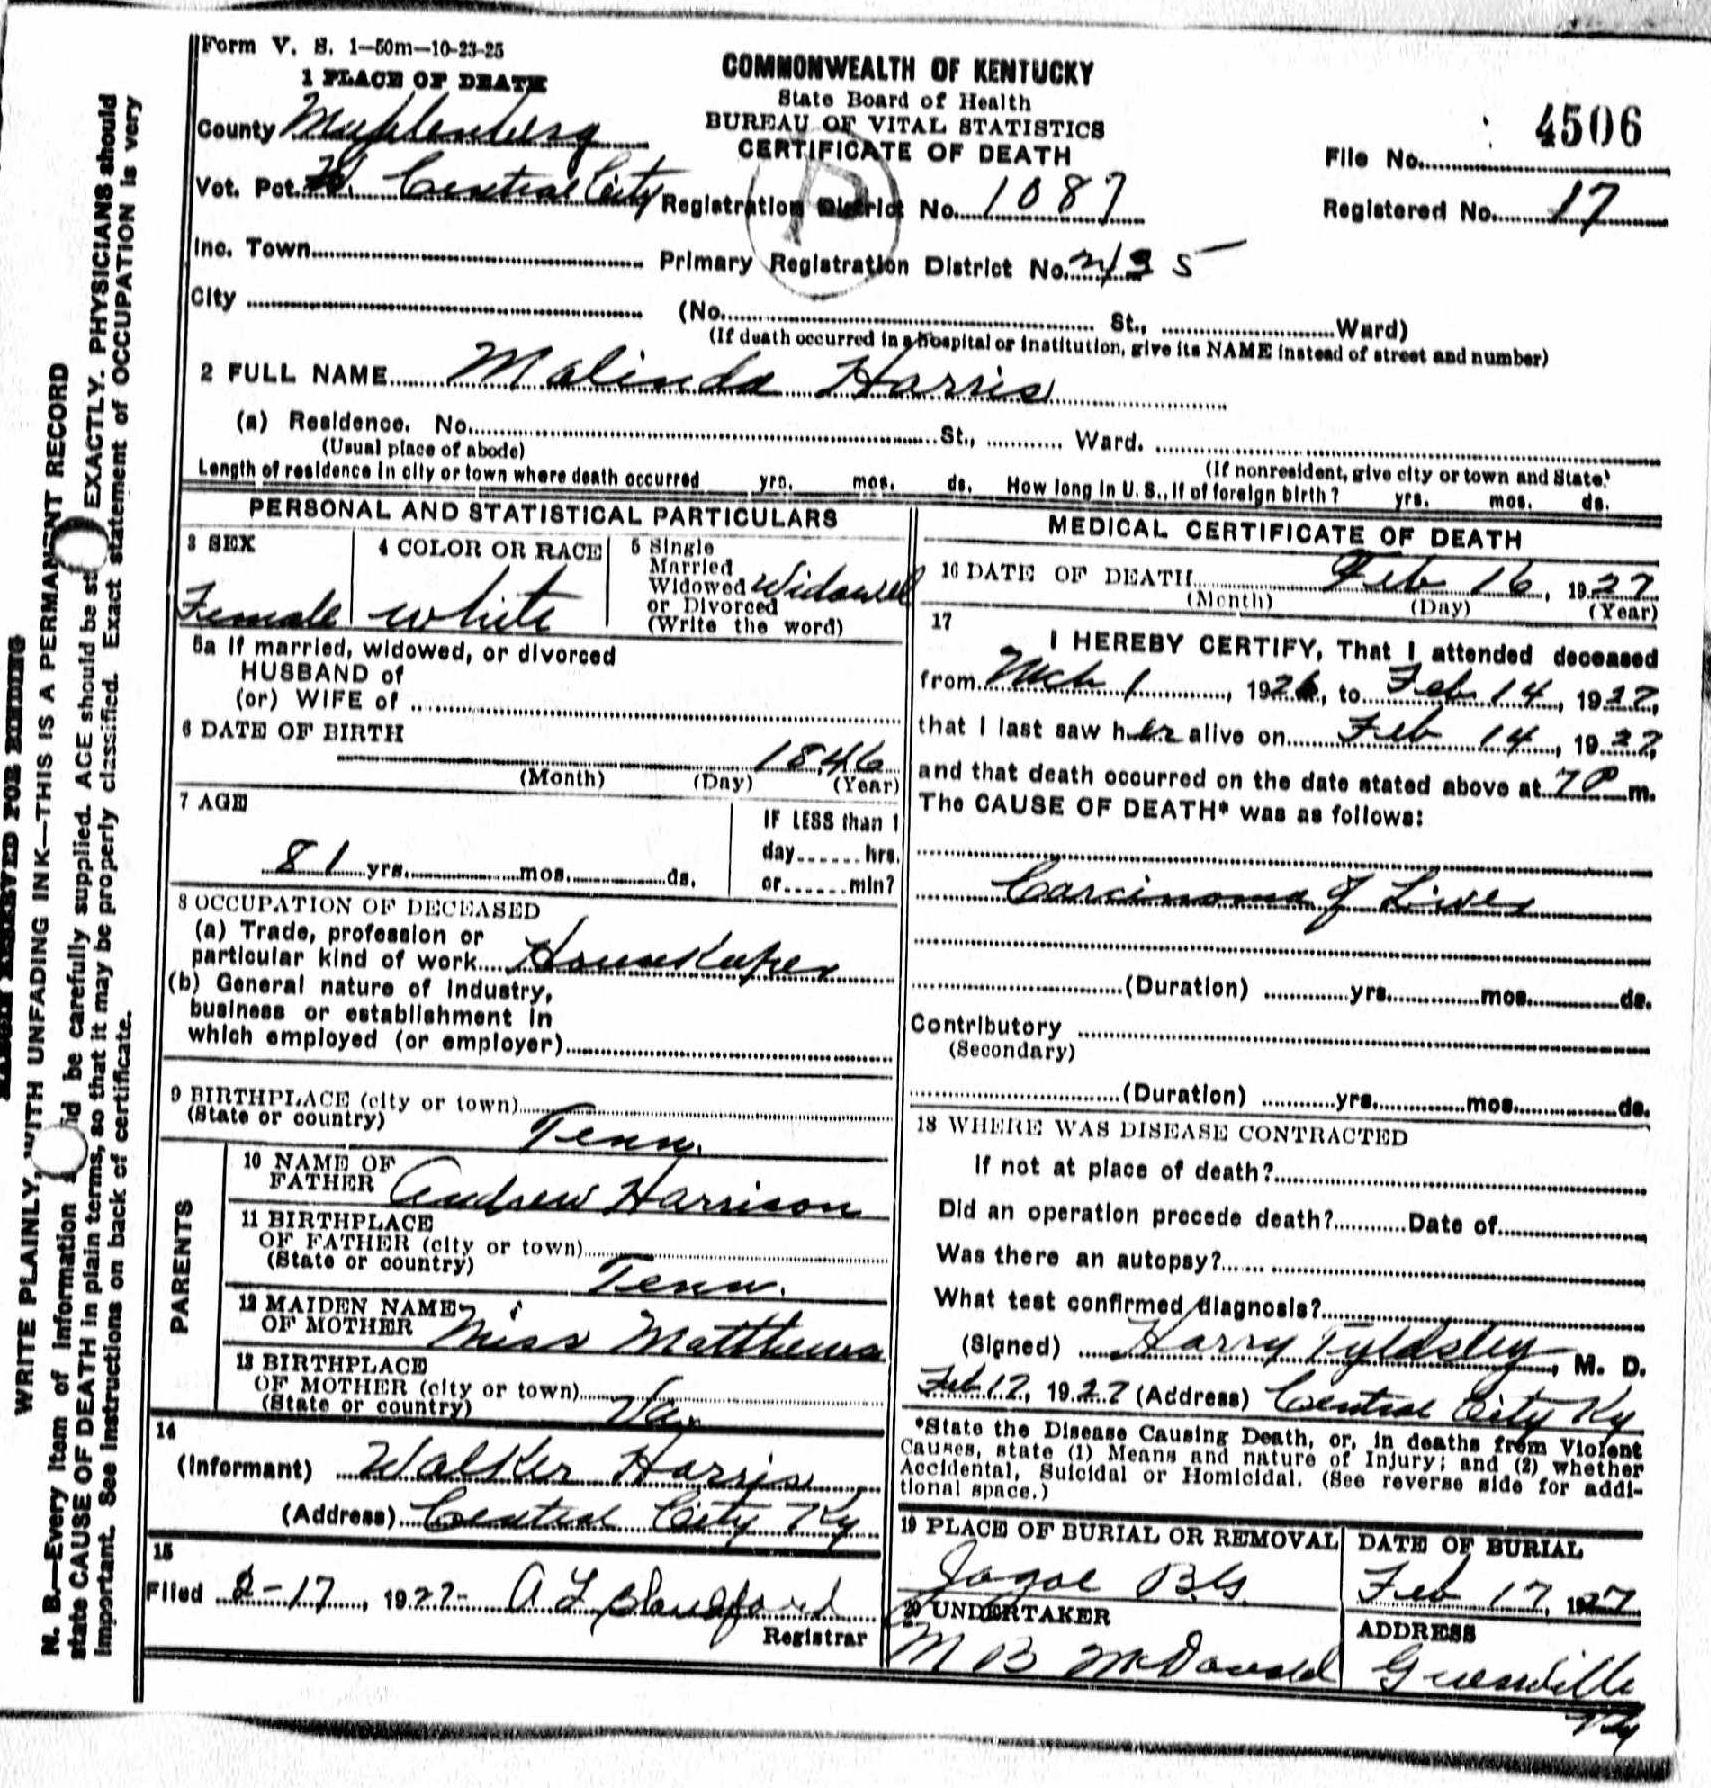 Death certificates h kentucky death certificate 4506 malinda harris 1846 1927 andrew harrison matthews walker harris central city muhlenberg kentucky tennessee 1betcityfo Images